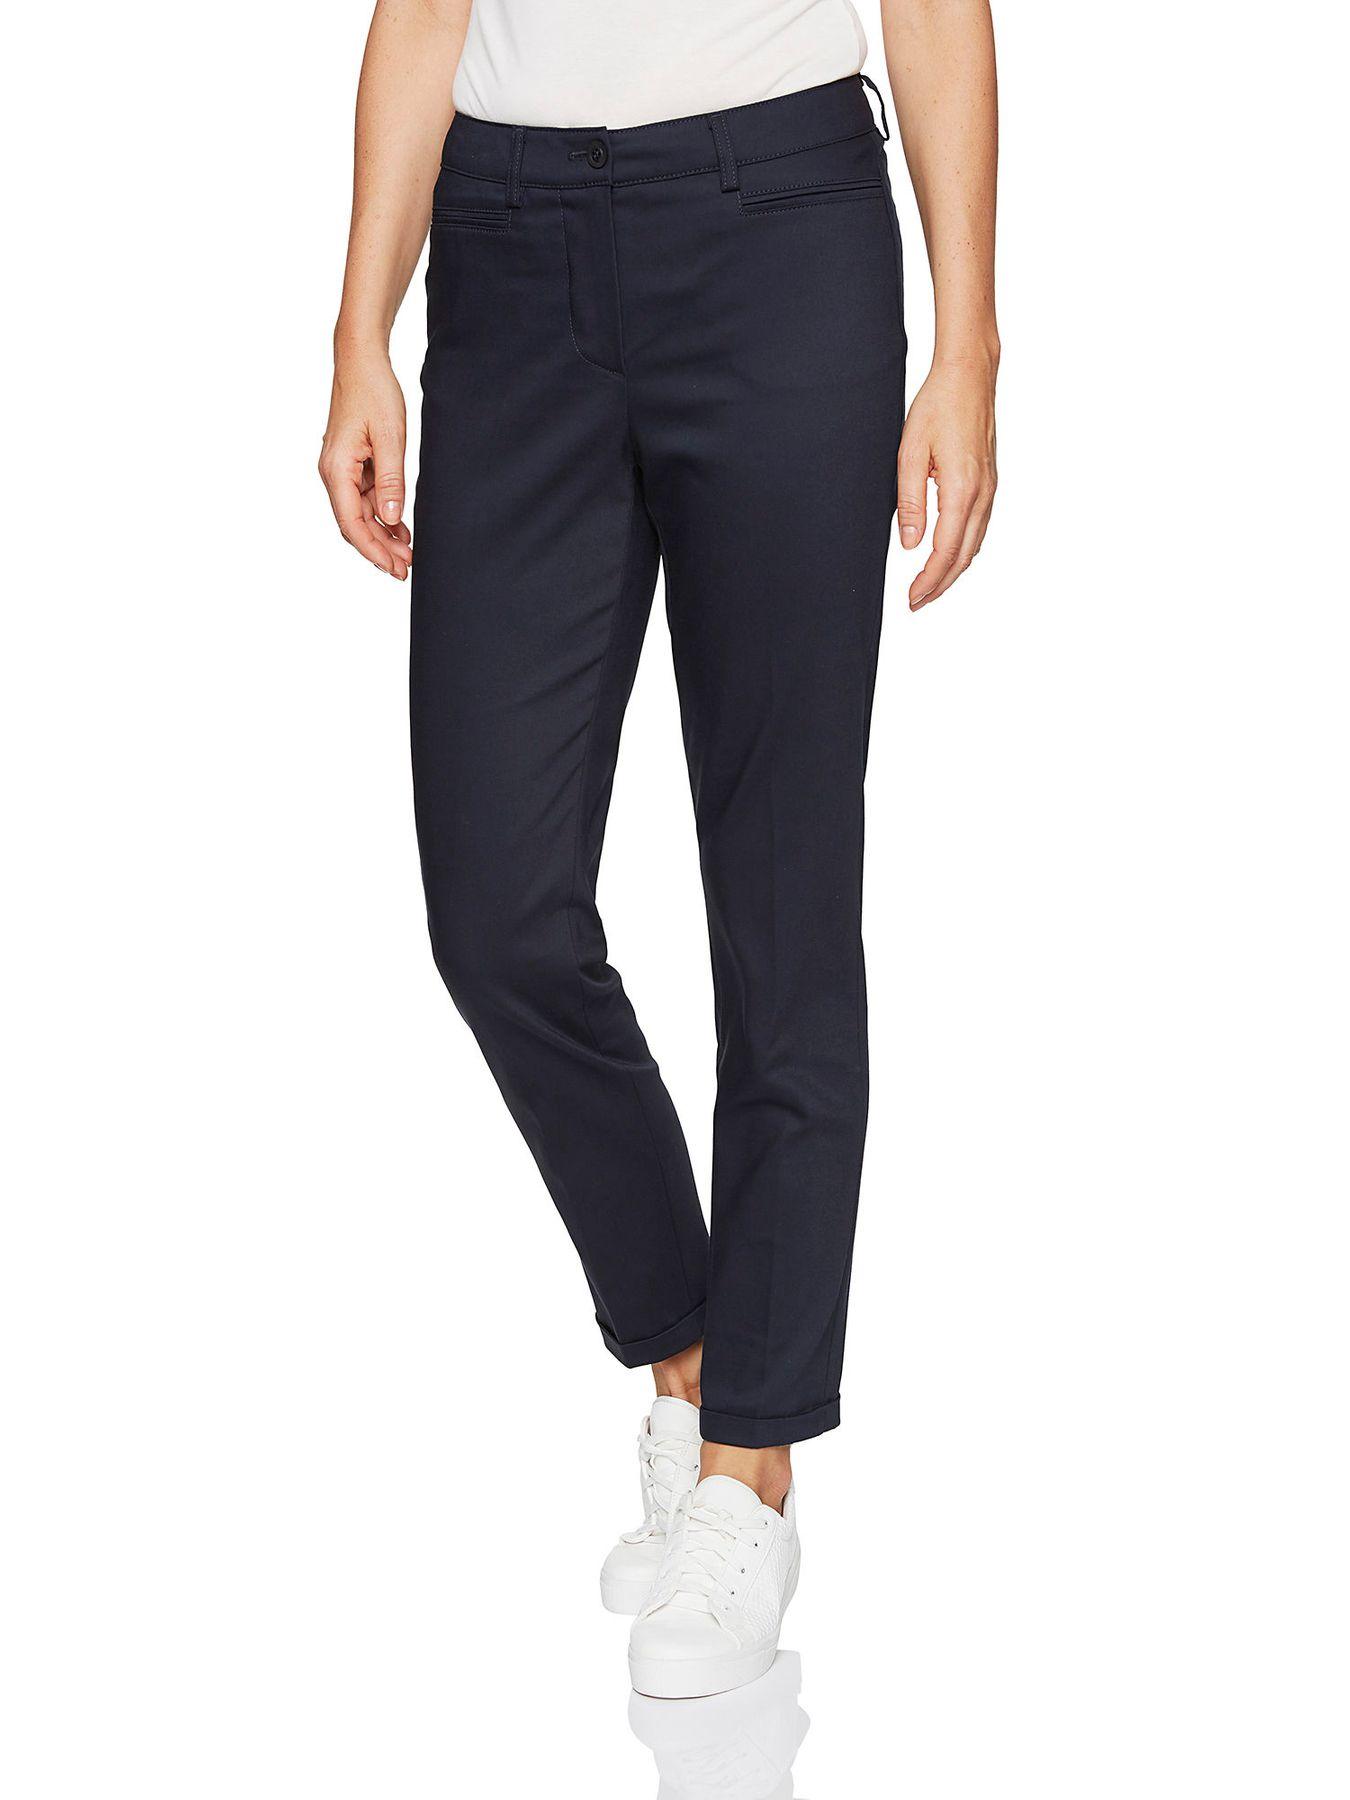 Atelier Gardeur - Slim Fit - Damen Röhrenhose aus Baumwoll-Materialmix in Marineblau Denise  (600411) – Bild 2